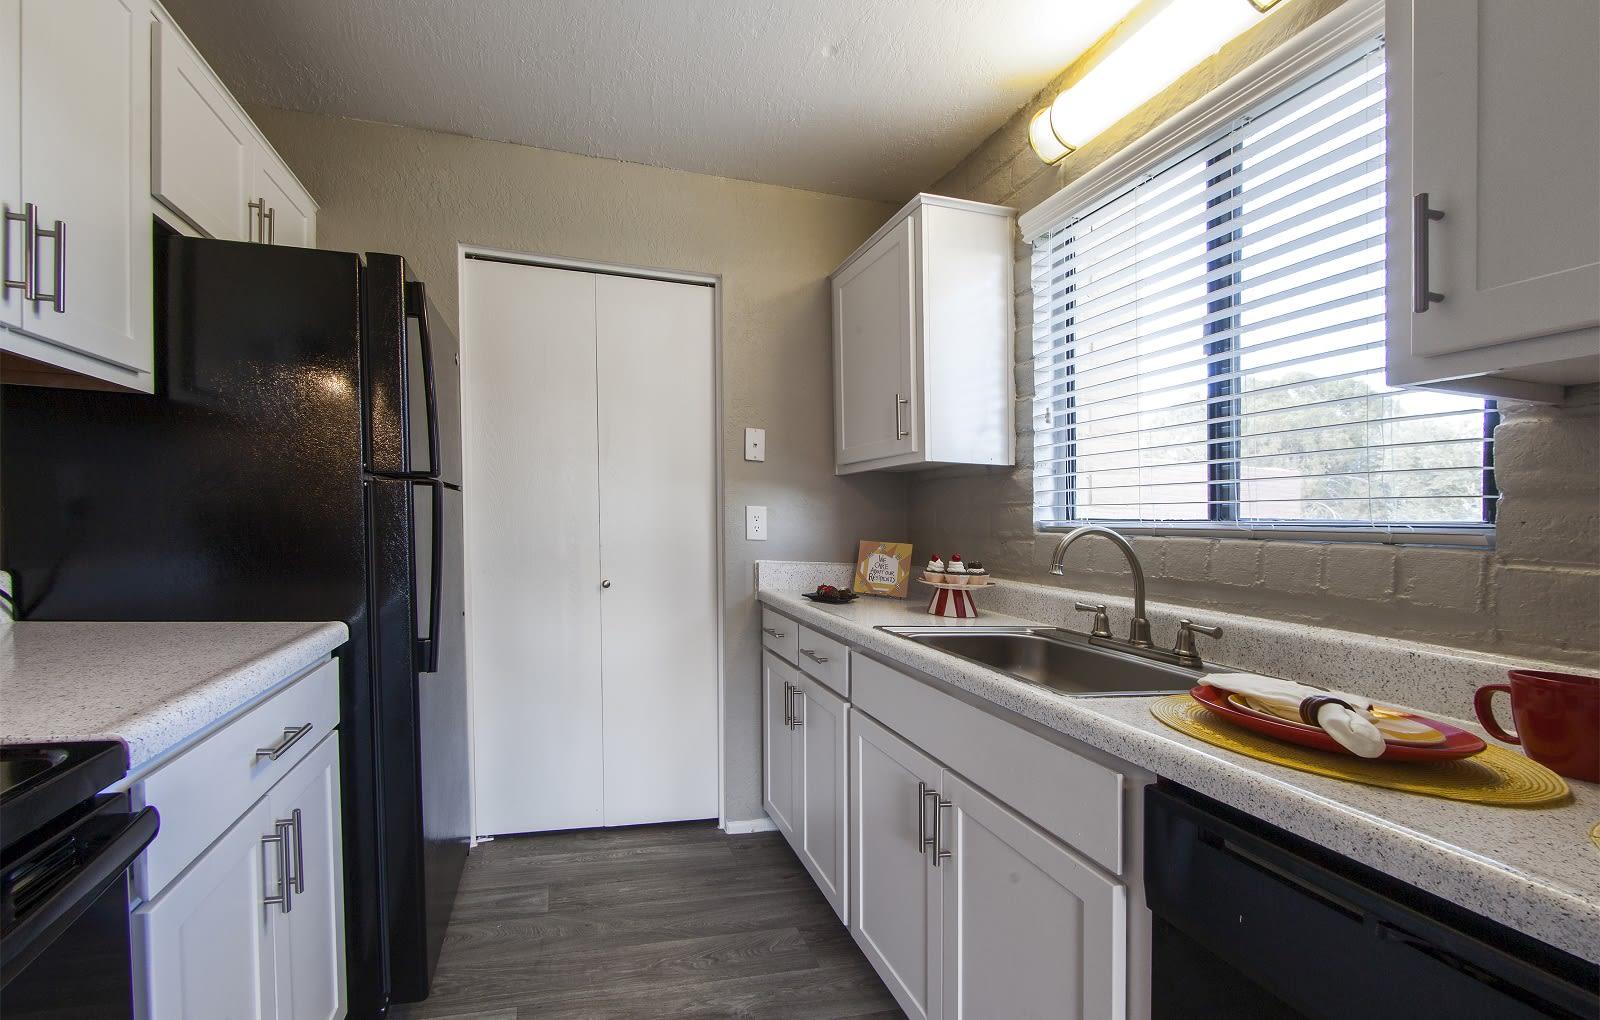 Kitchen at Mission Palms Apartments in Tucson, AZ